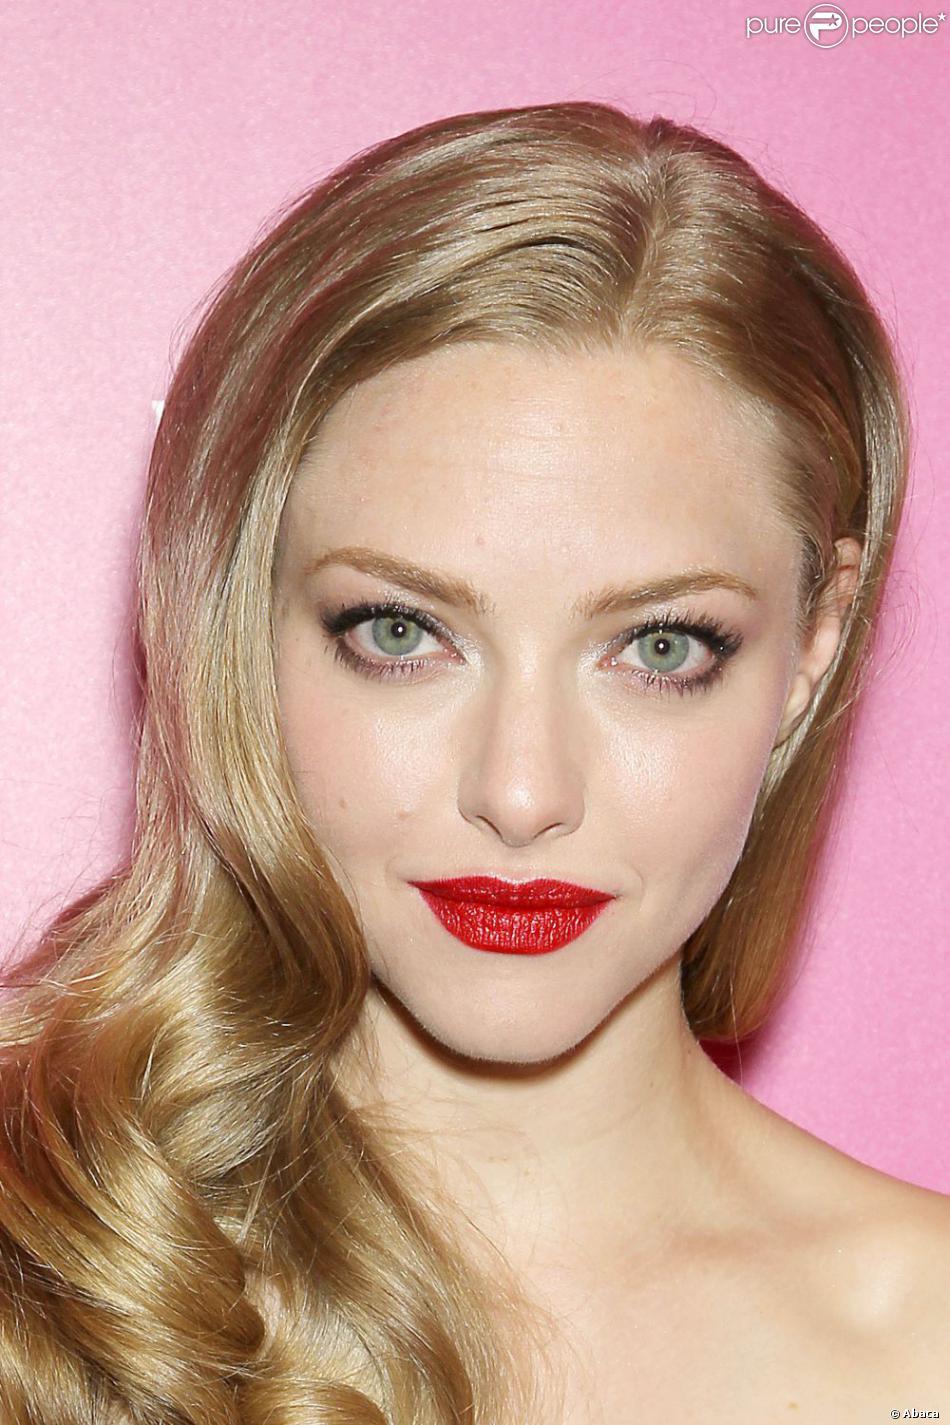 amanda_lovelace_newyork_Clé de Peau Beauté's Extra Rich Lipstick in #311 Red Abundance_cliomakeup